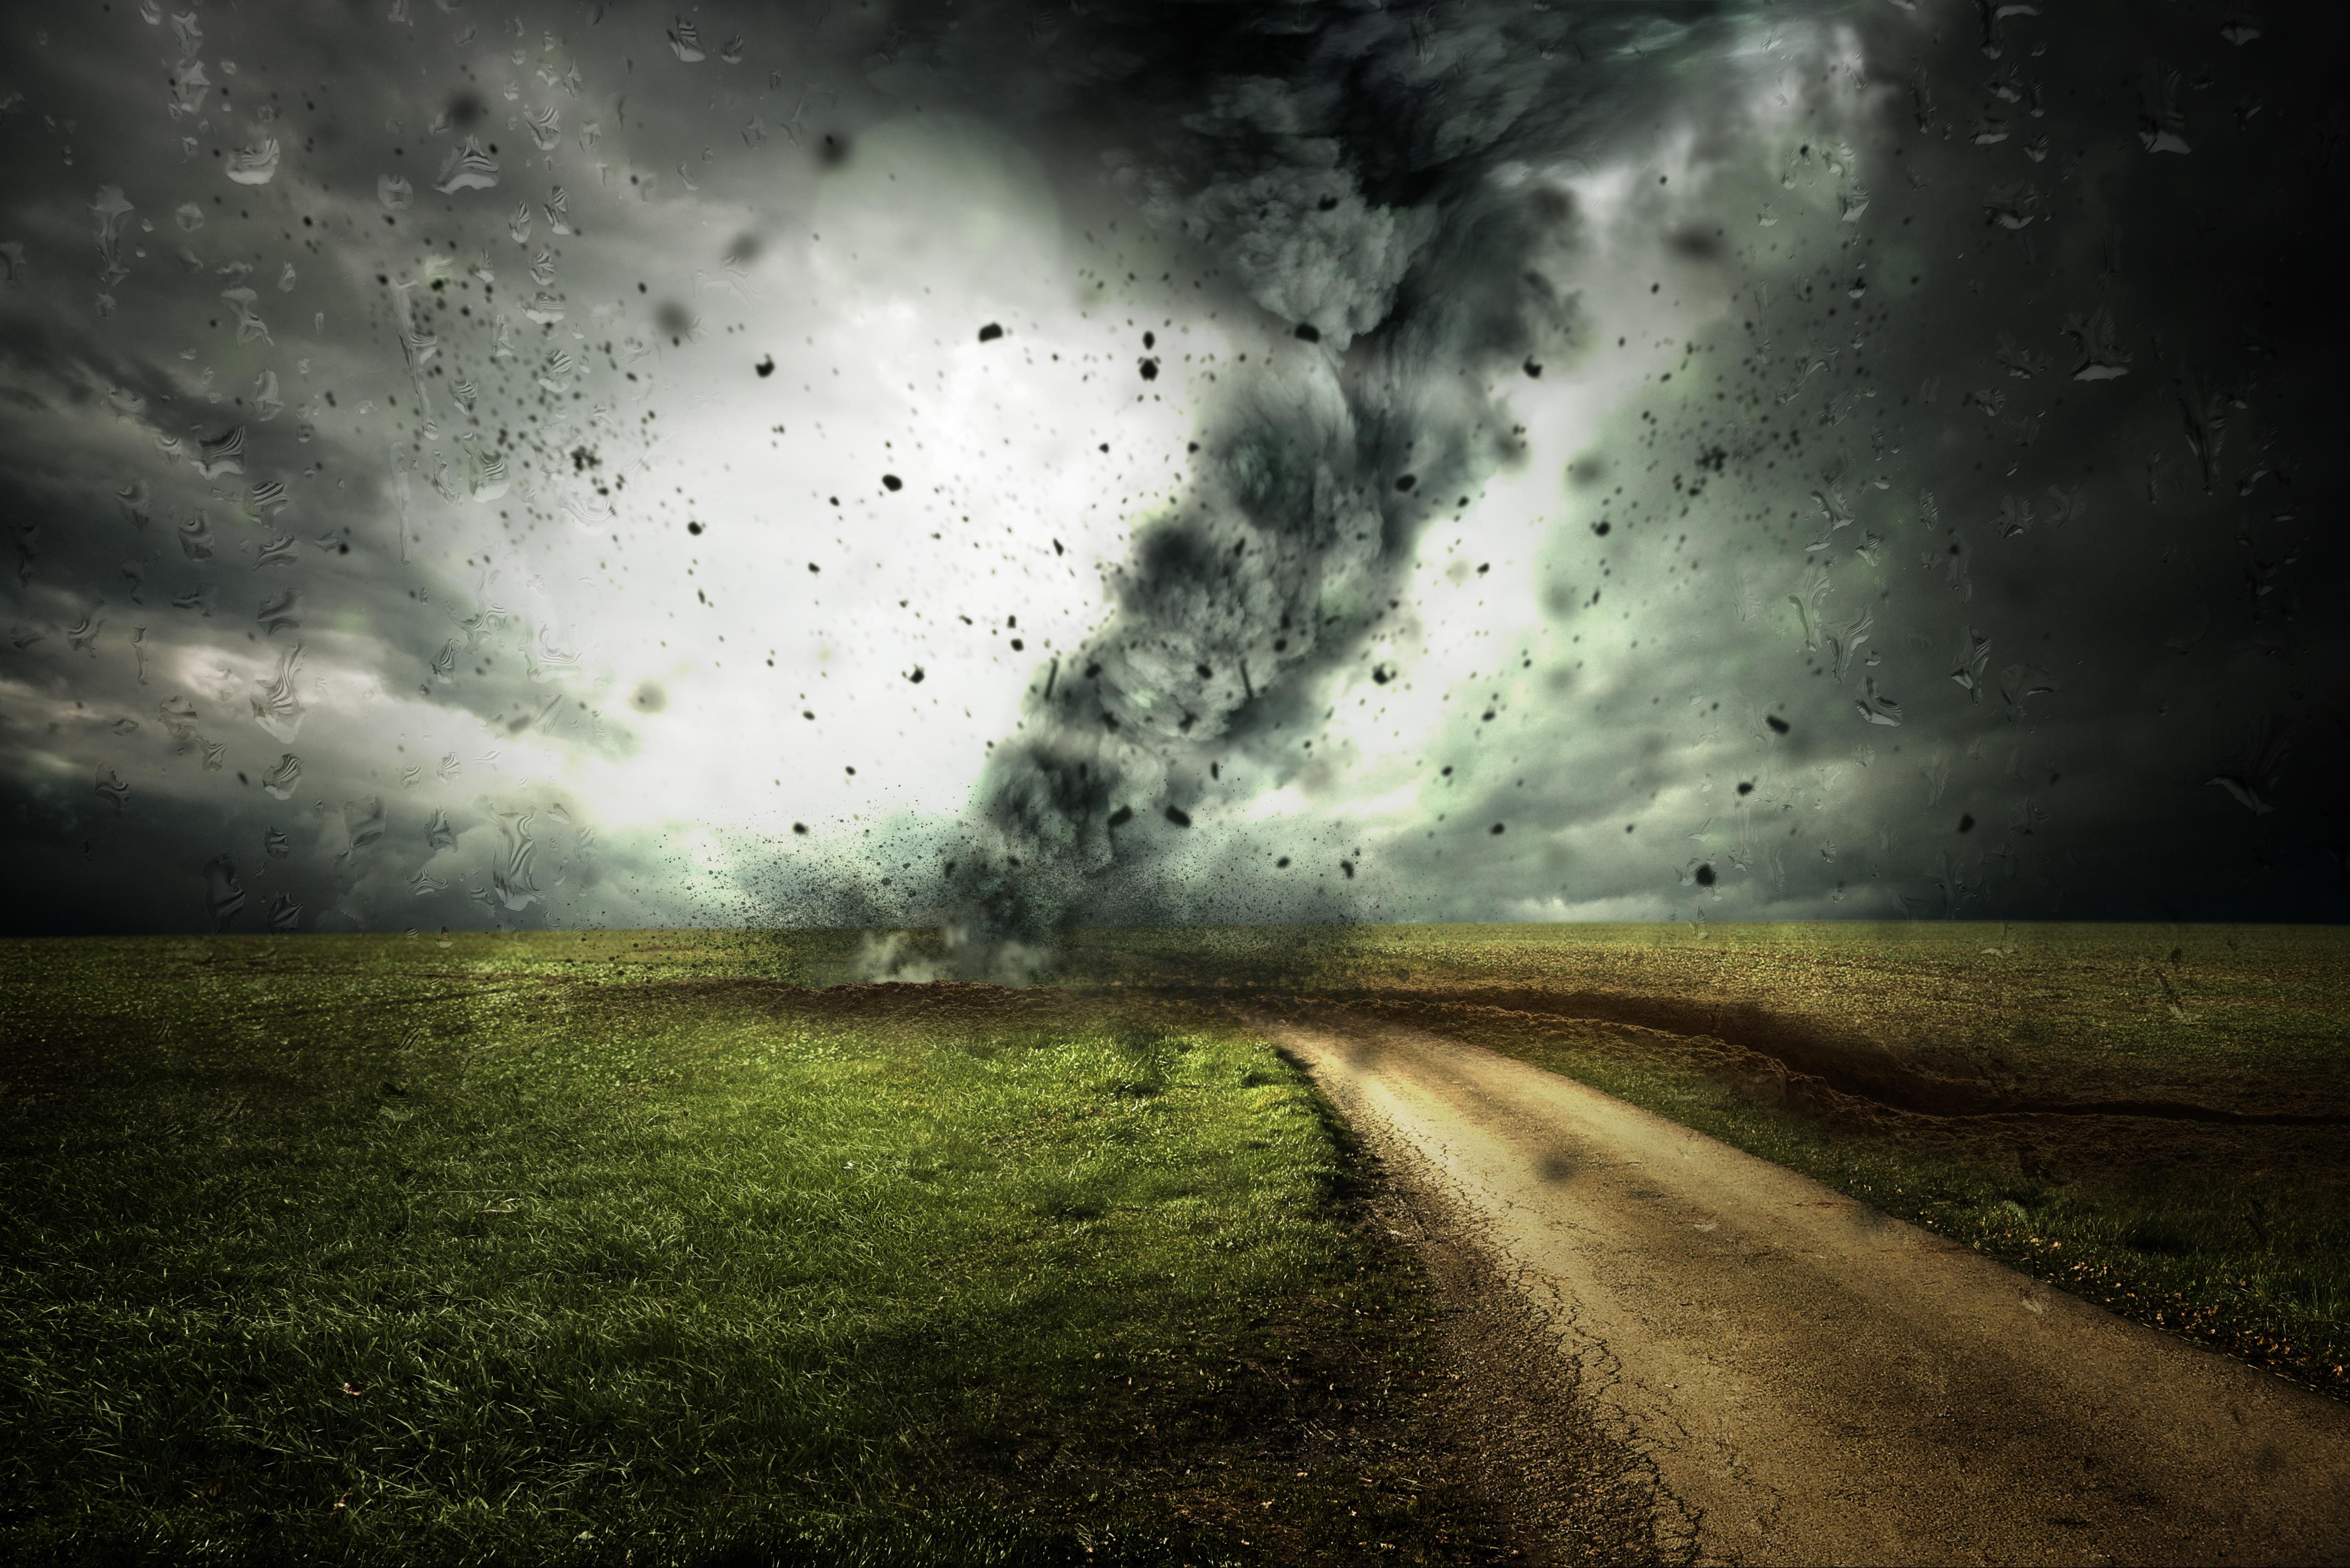 cyclone-2102397